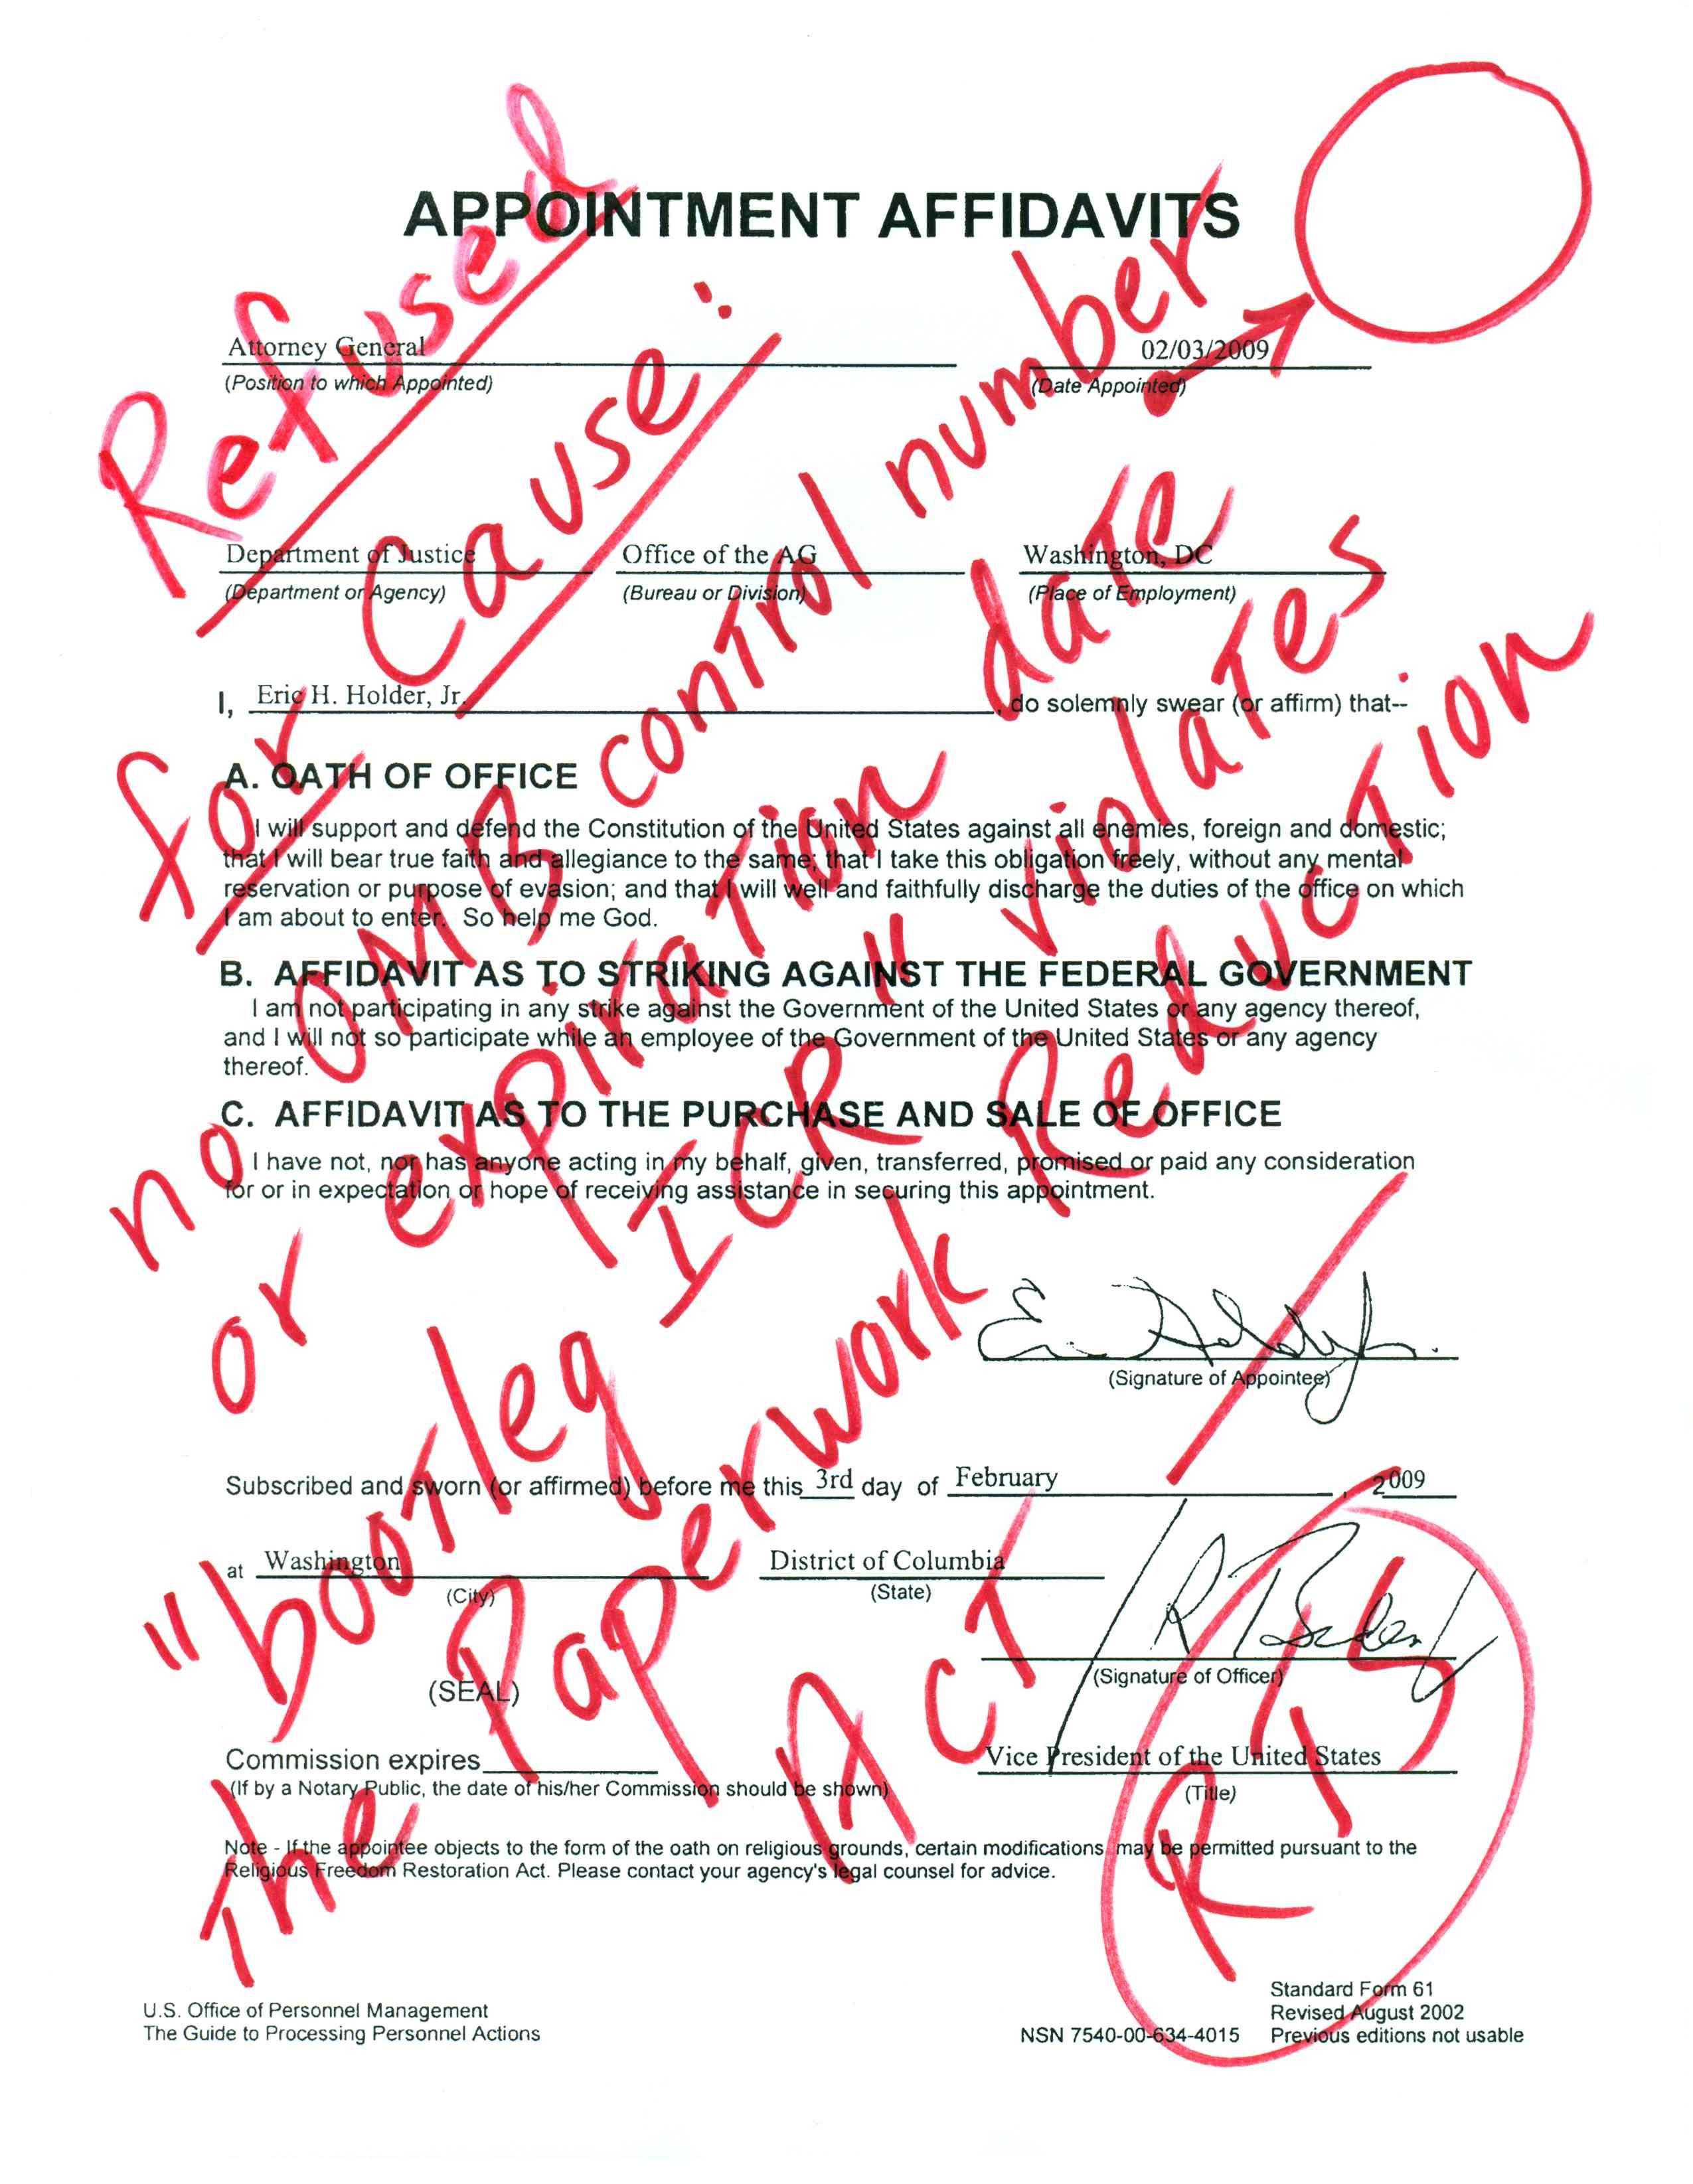 public notice major admission by omb org cc sebelius holder letter 2010 06 09 affidavit gif